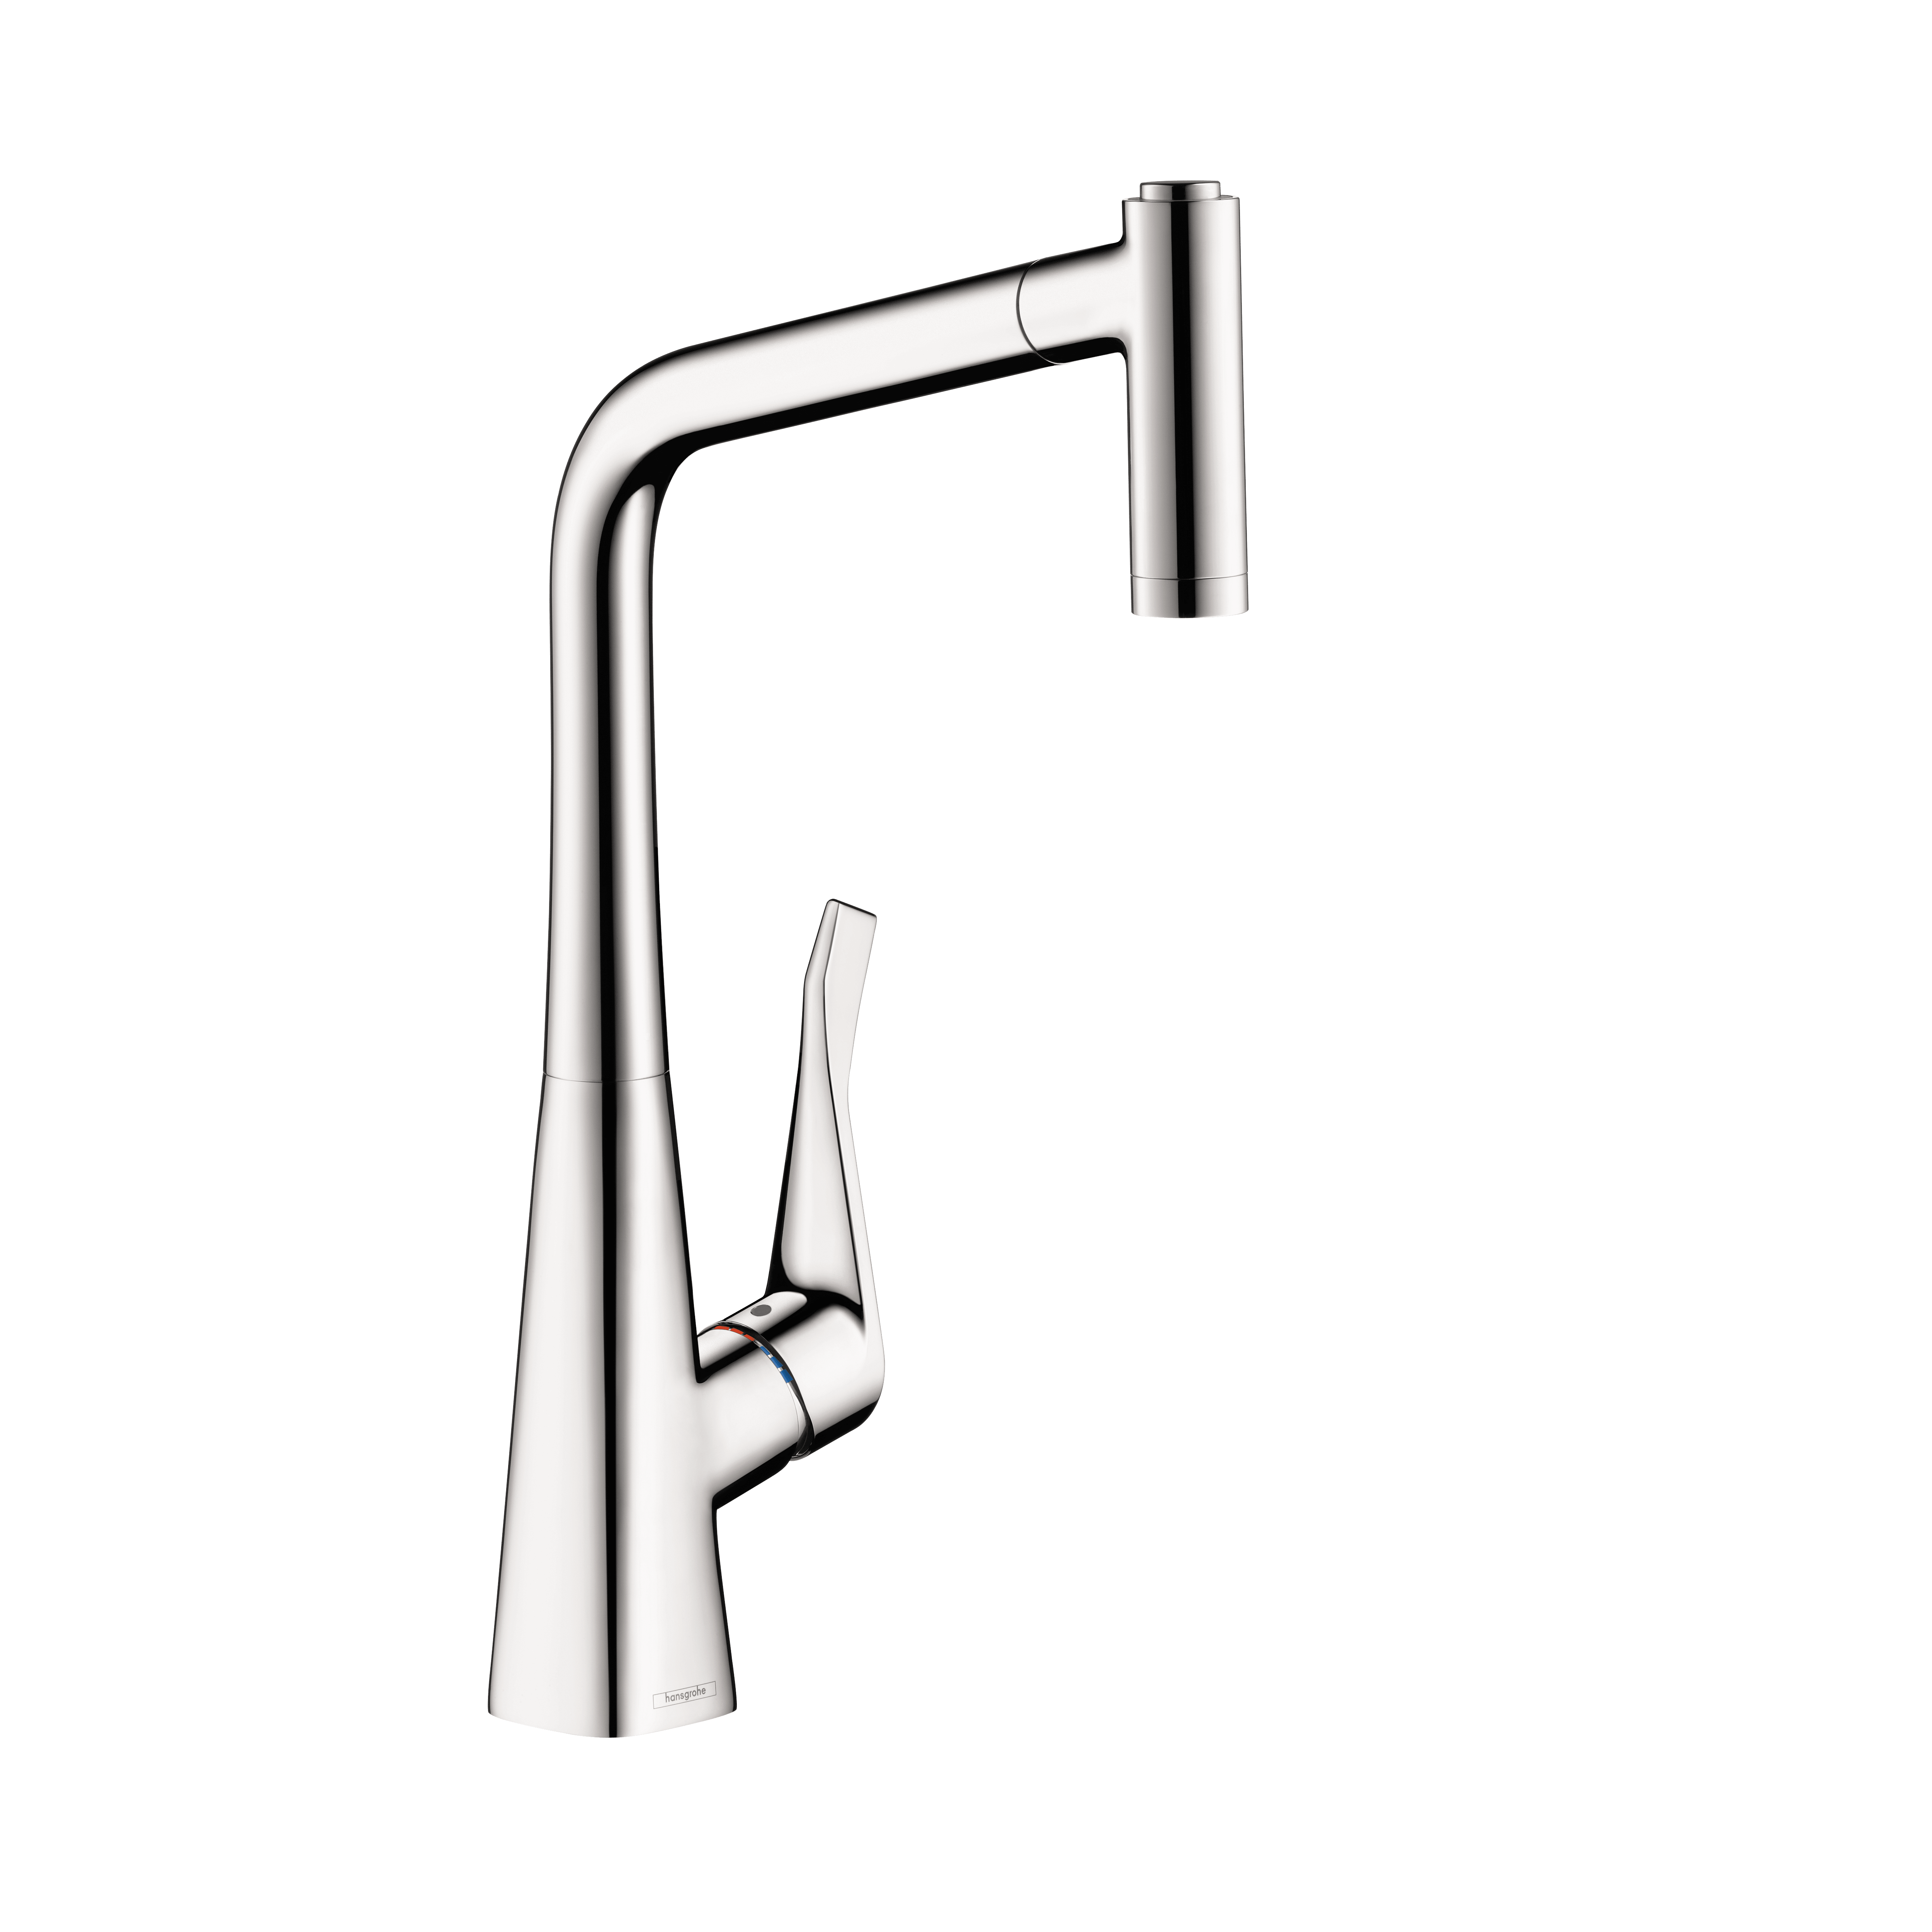 Hansgrohe 14820 Metris Kitchen Faucet | QualityBath.com